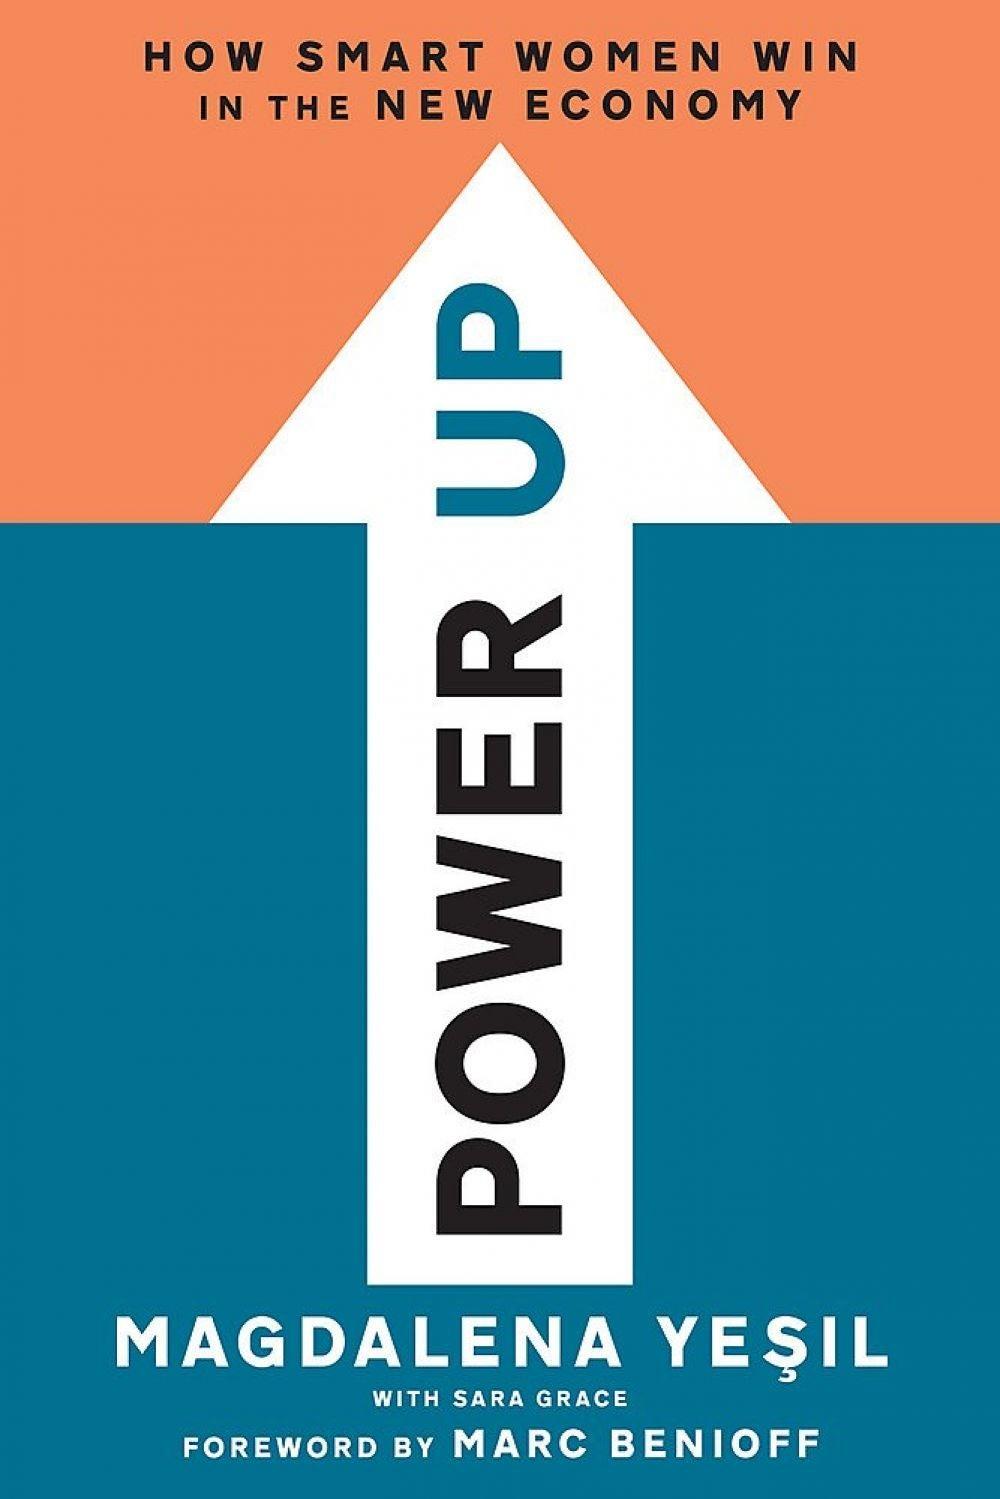 Power Up: How Smart Women Win the Economy